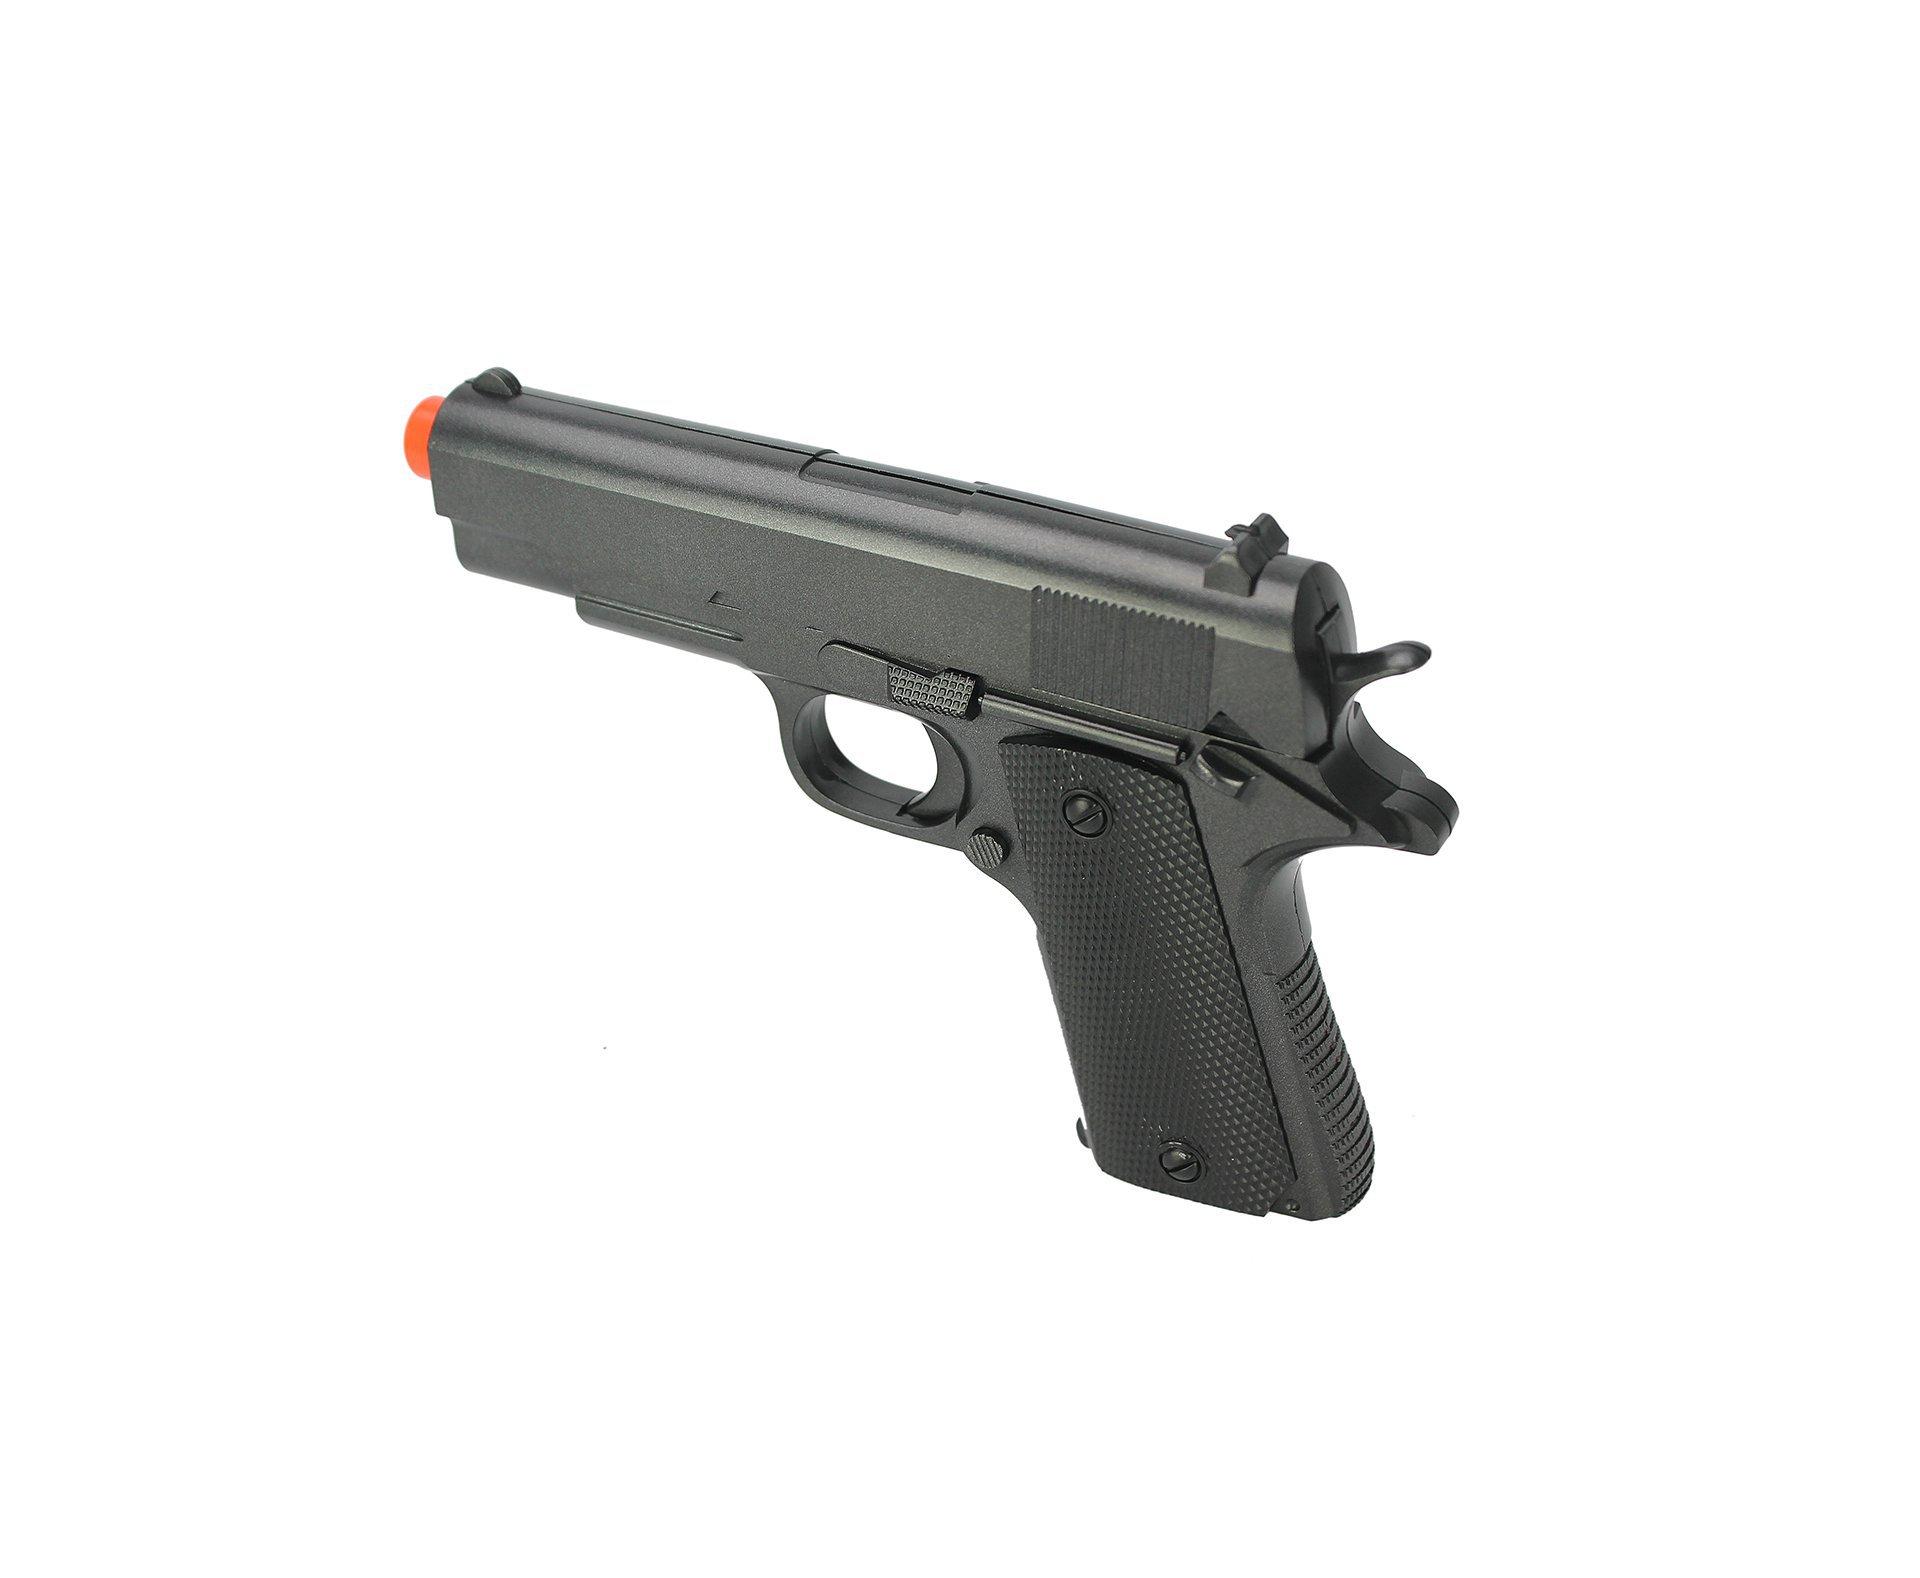 Pistola De Airsoft Cyma Zm04 Spring Rossi - Cal 6.0mm